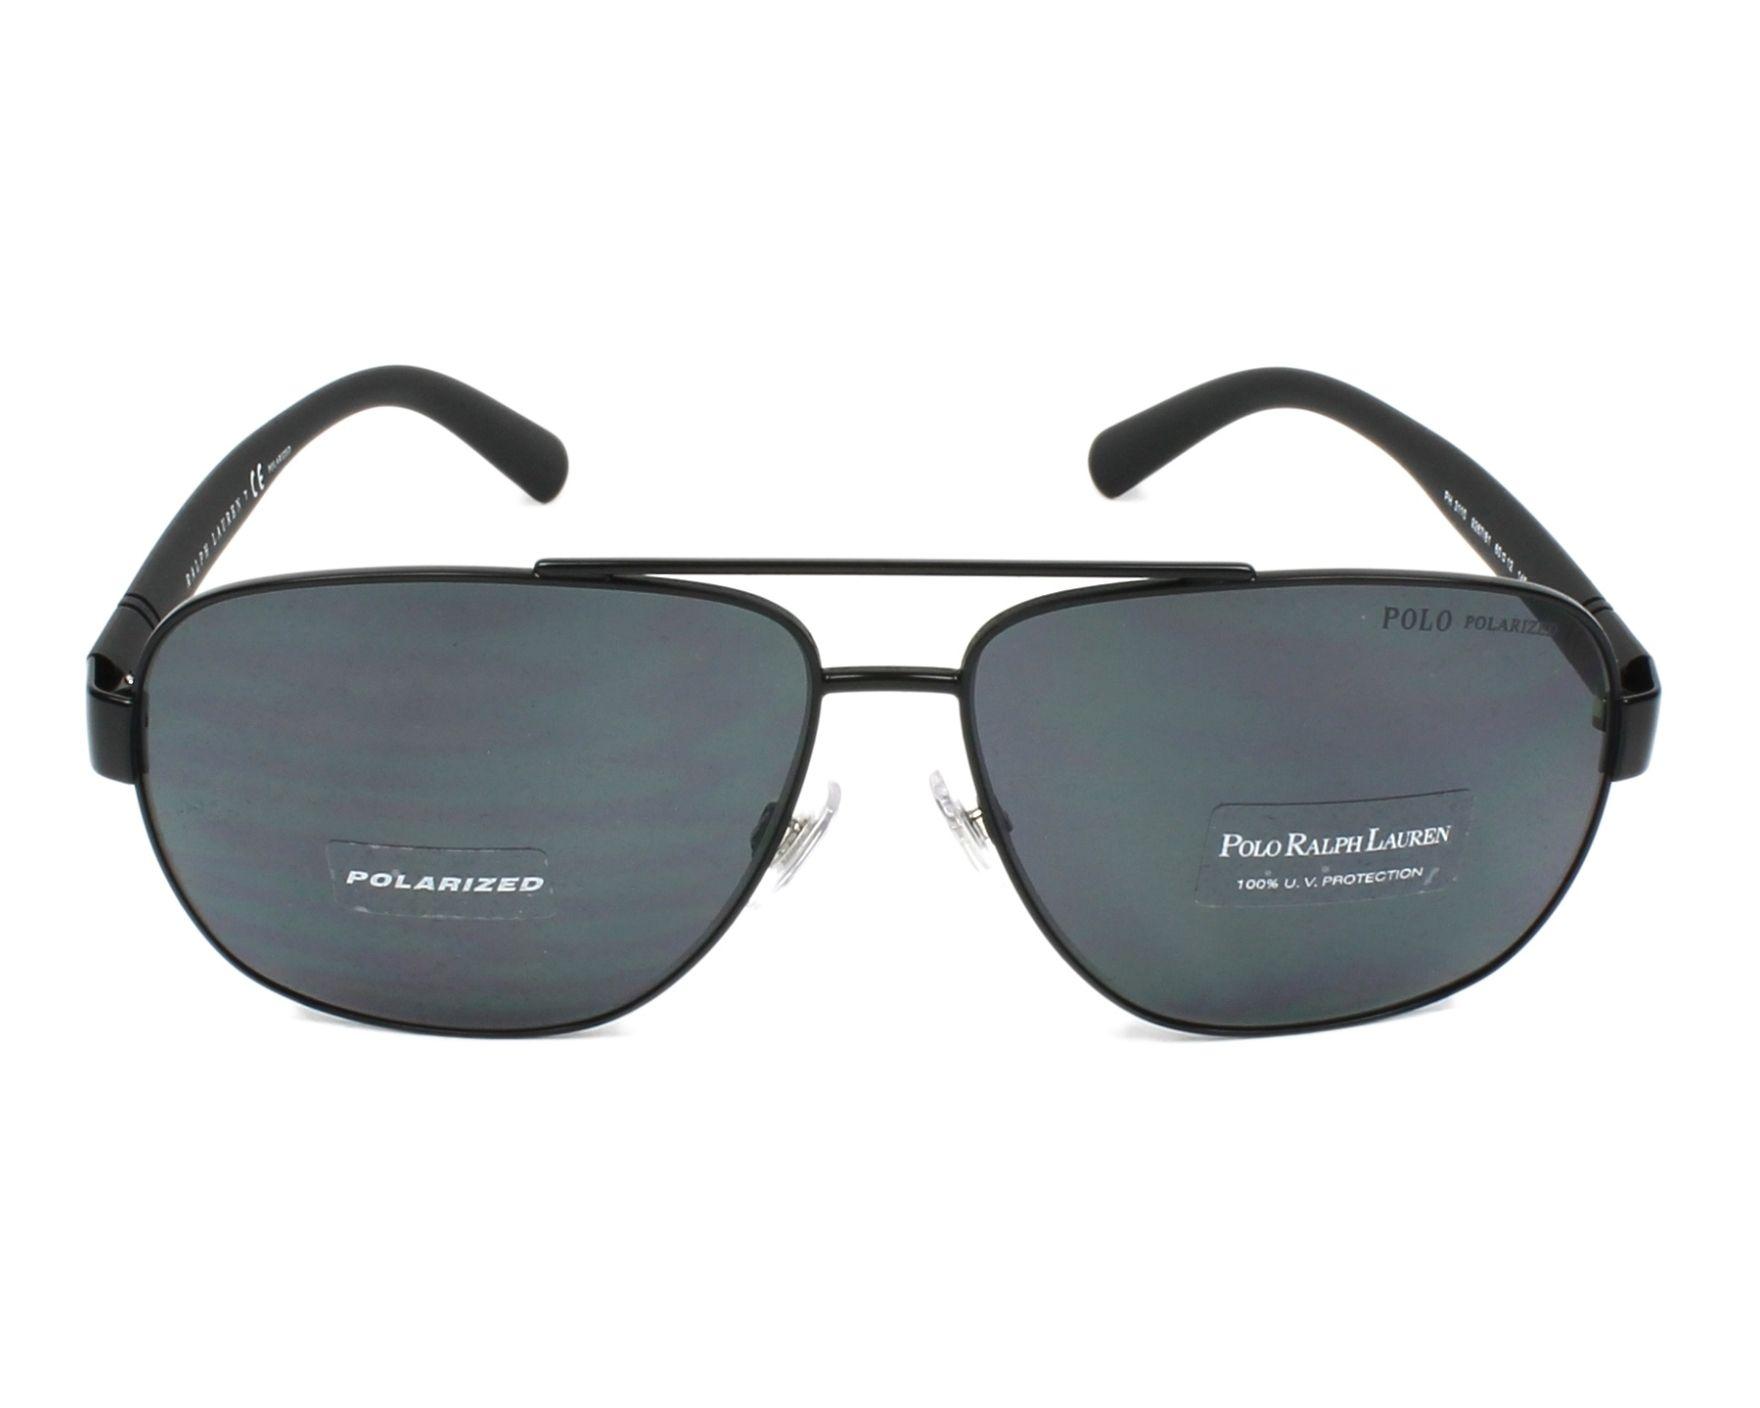 c27b3f5a5c Sunglasses Polo Ralph Lauren PH-3110 926781 - Black front view